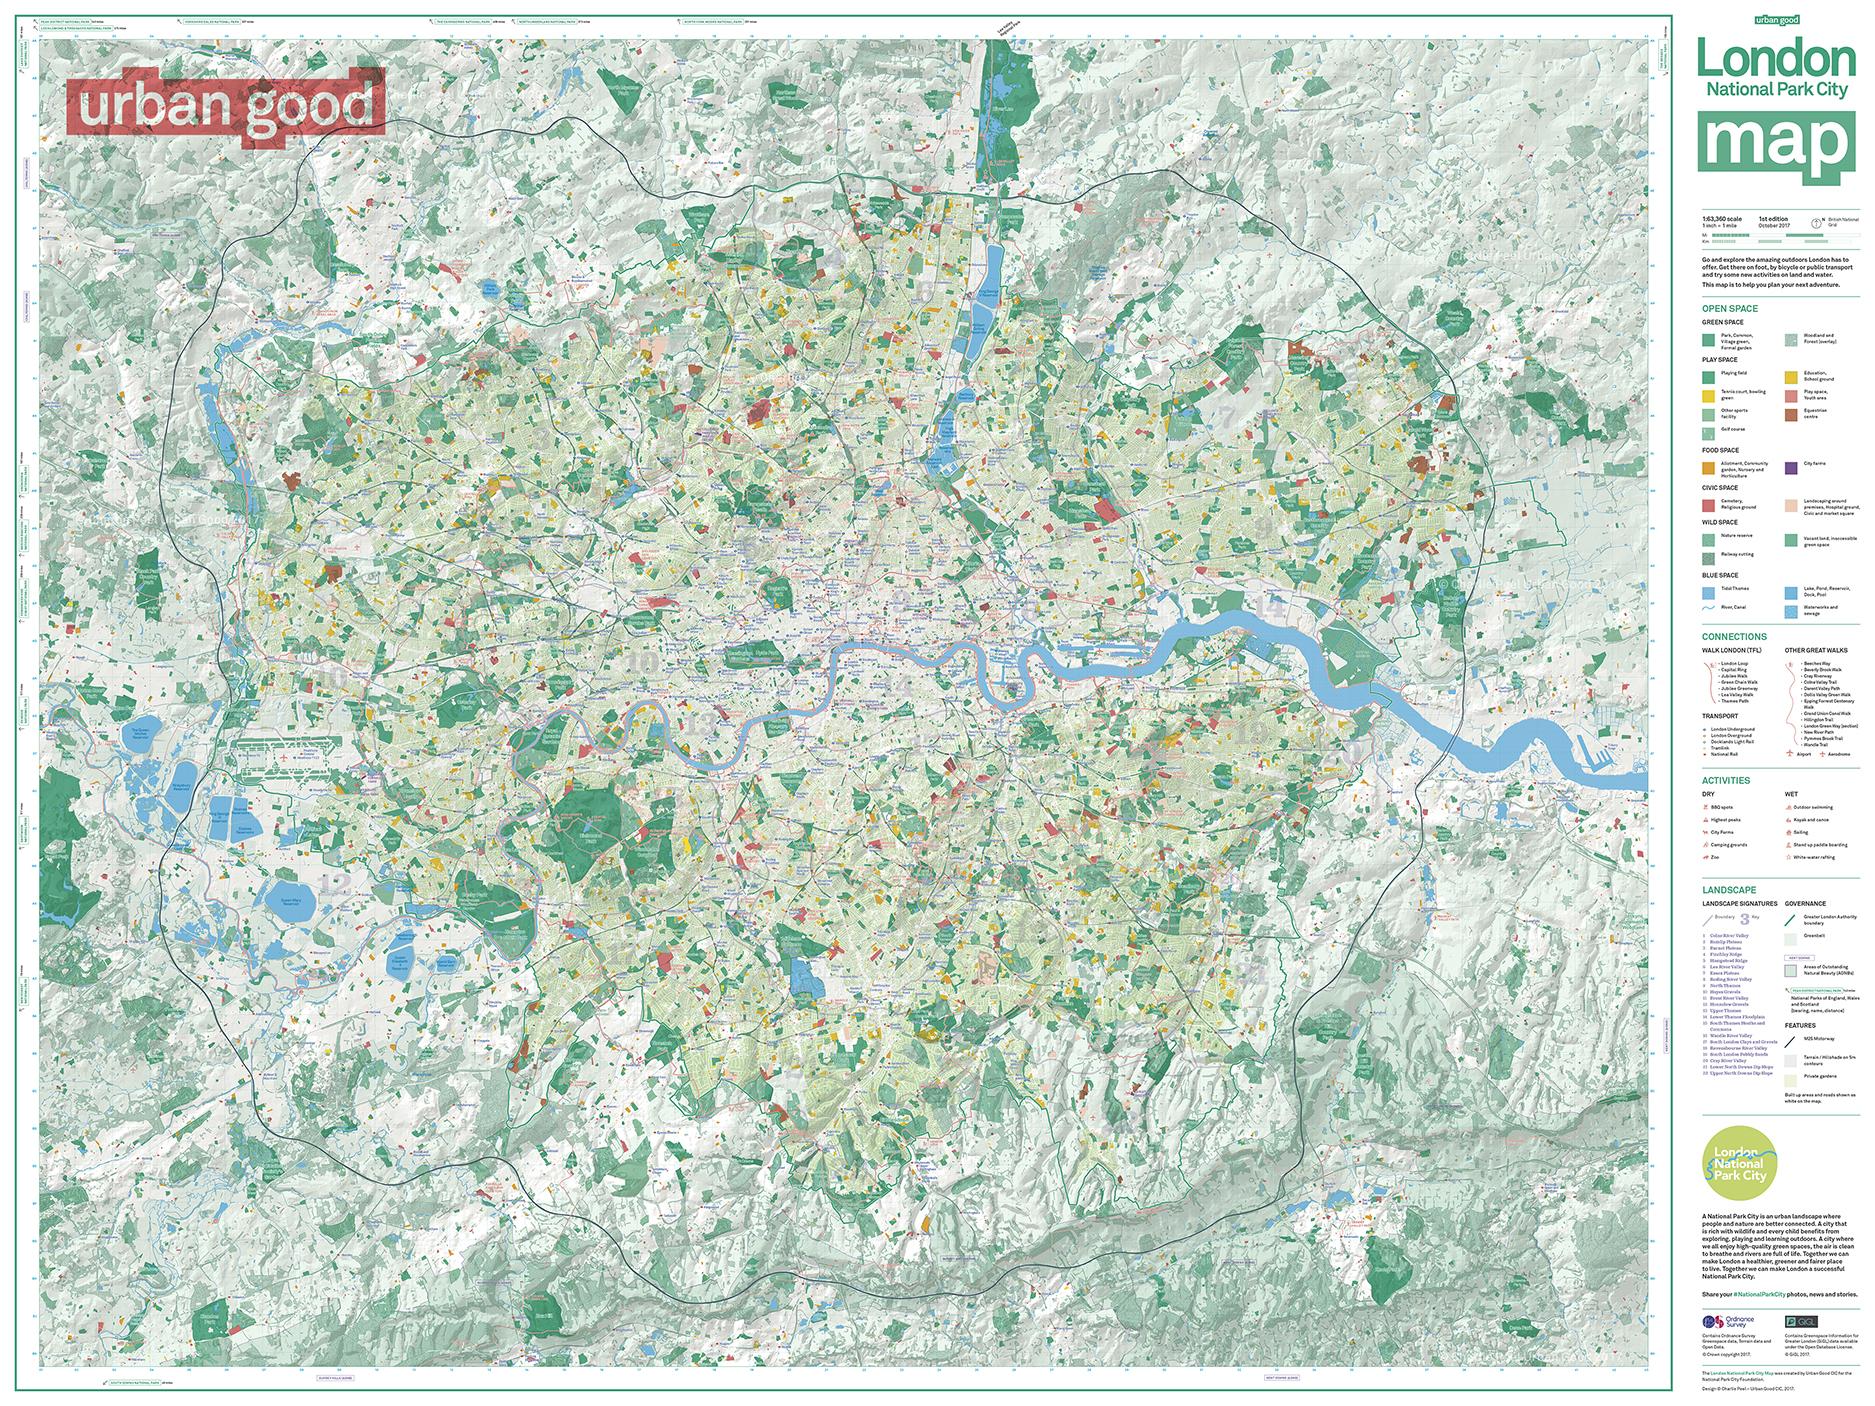 UrbanGood_National_Park_City_Map_full_Charlie_Peel_2017.jpg